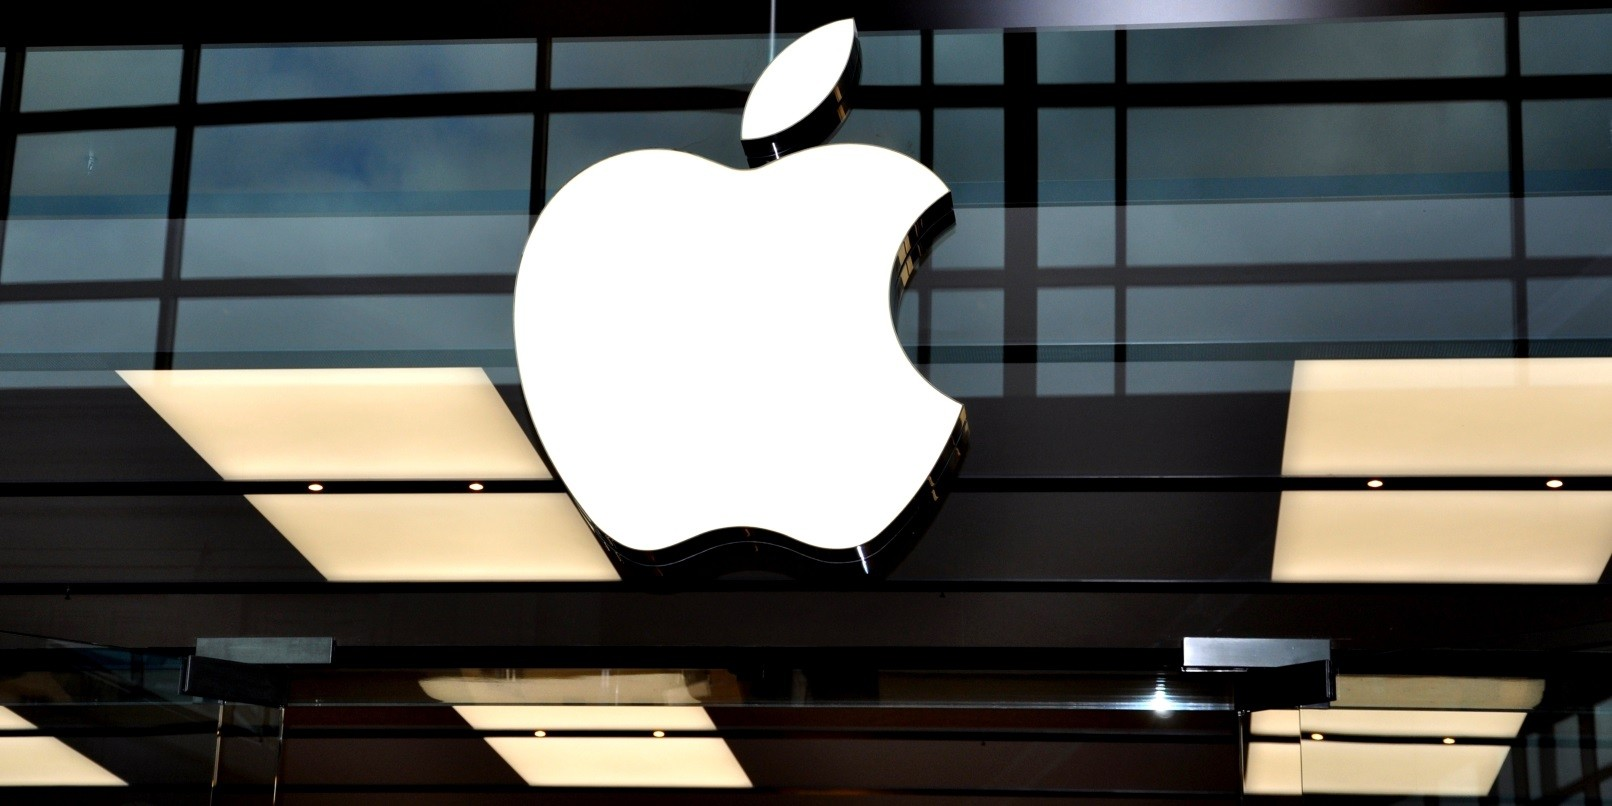 СМИ узнали опатенте Apple наскладной iPhone